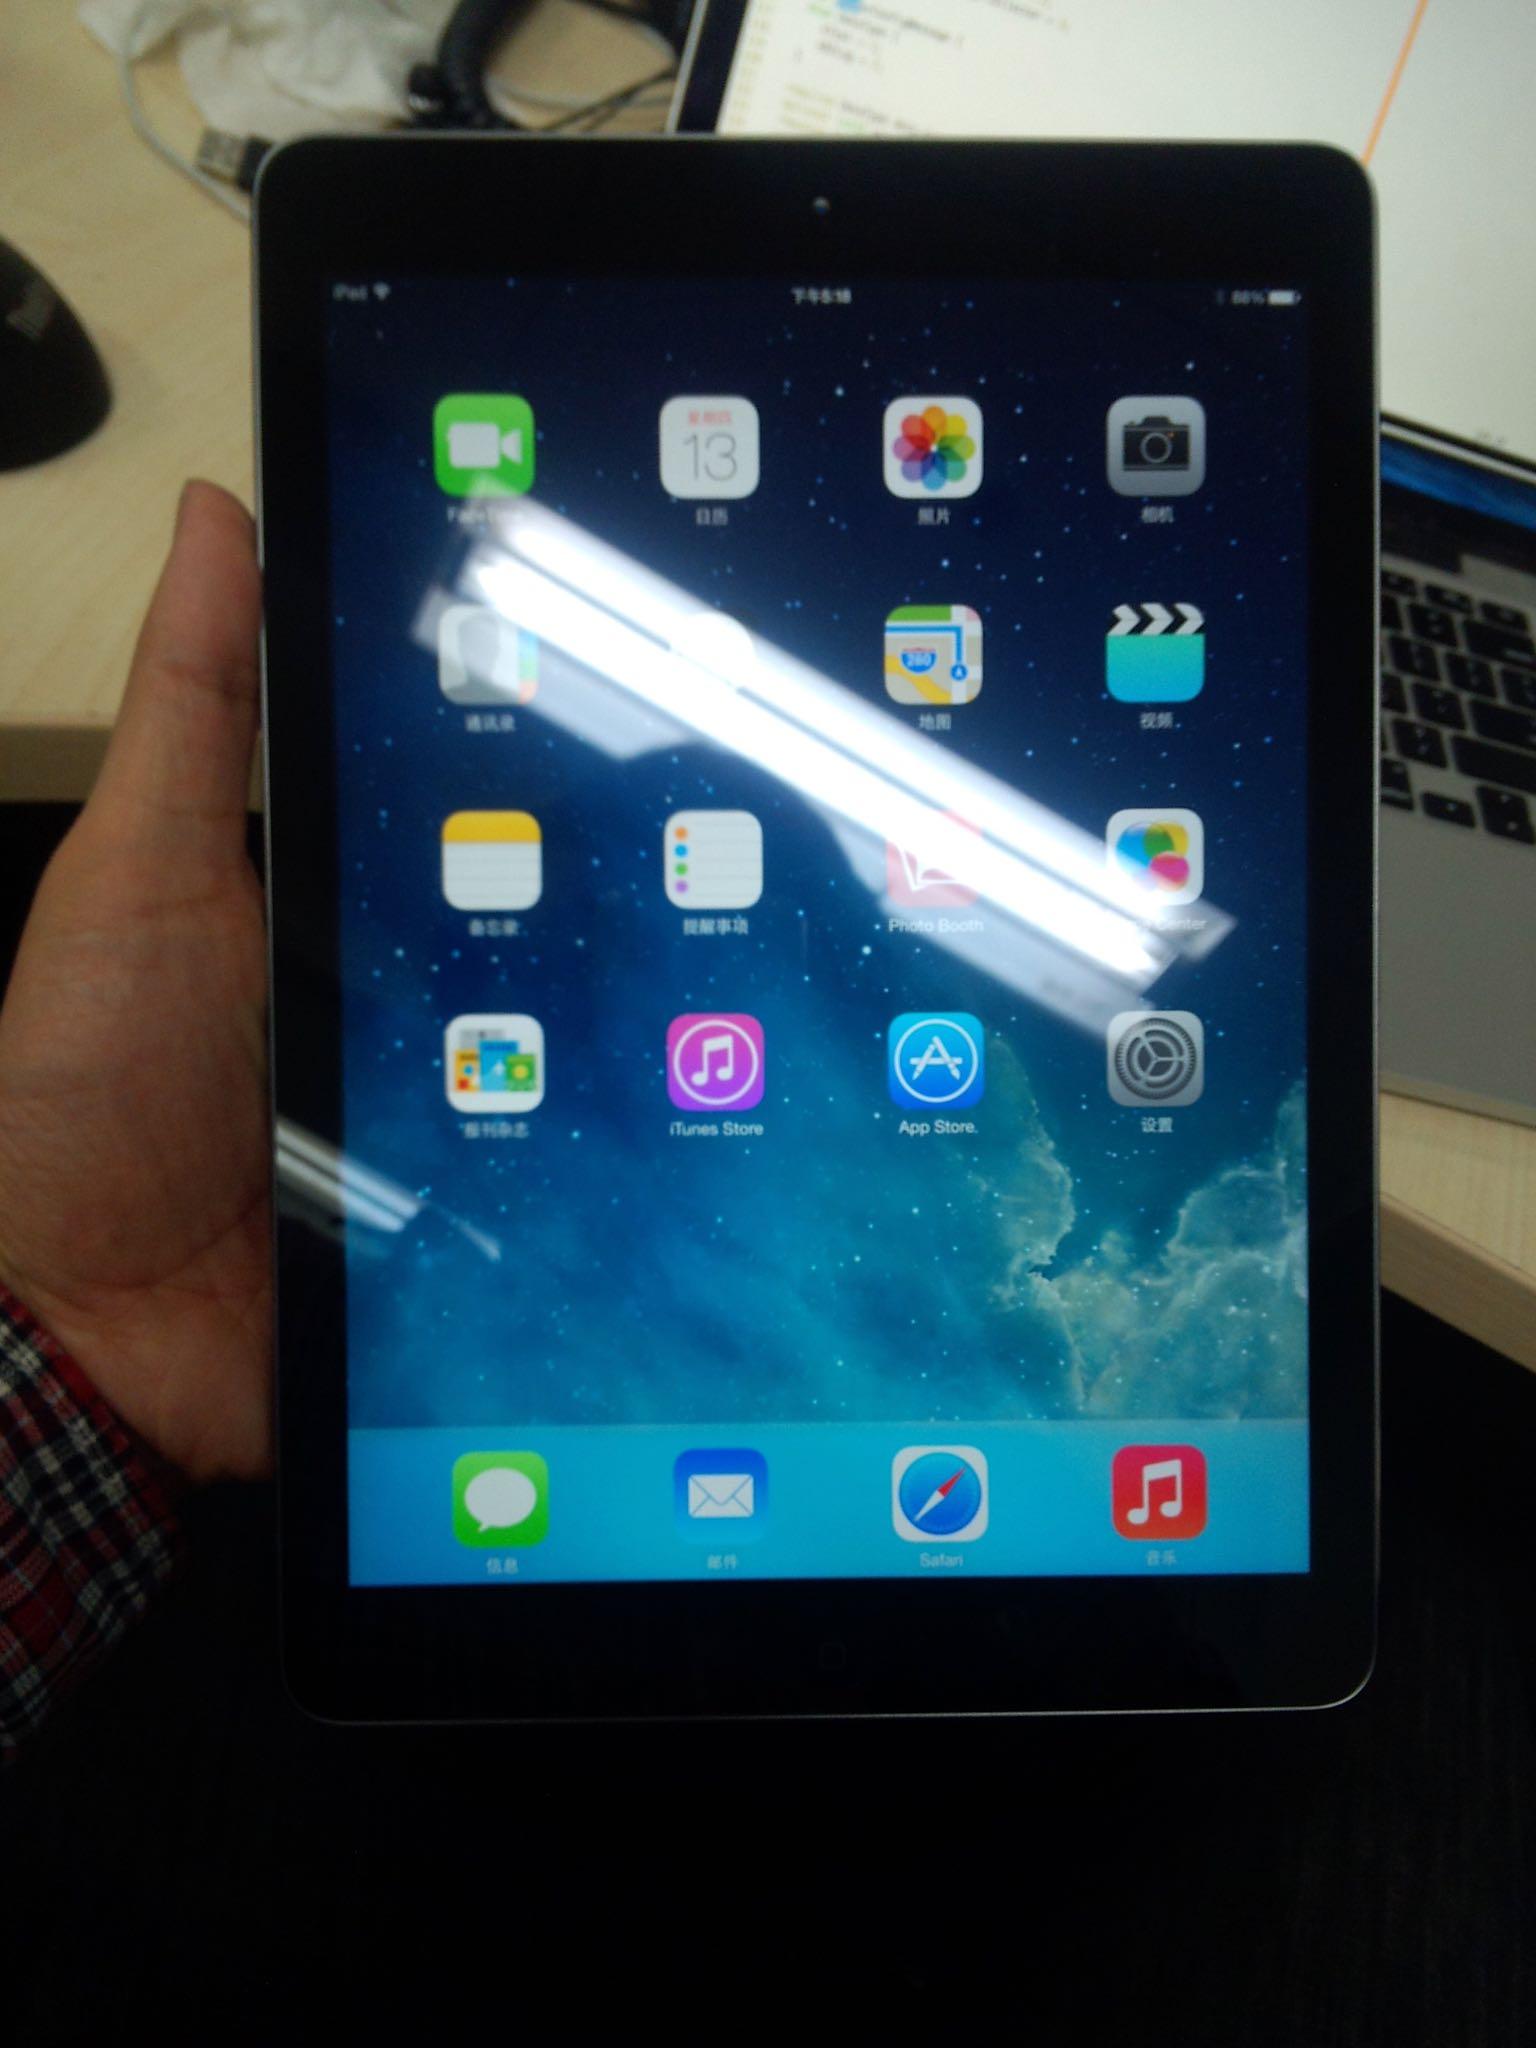 取出iPad Air